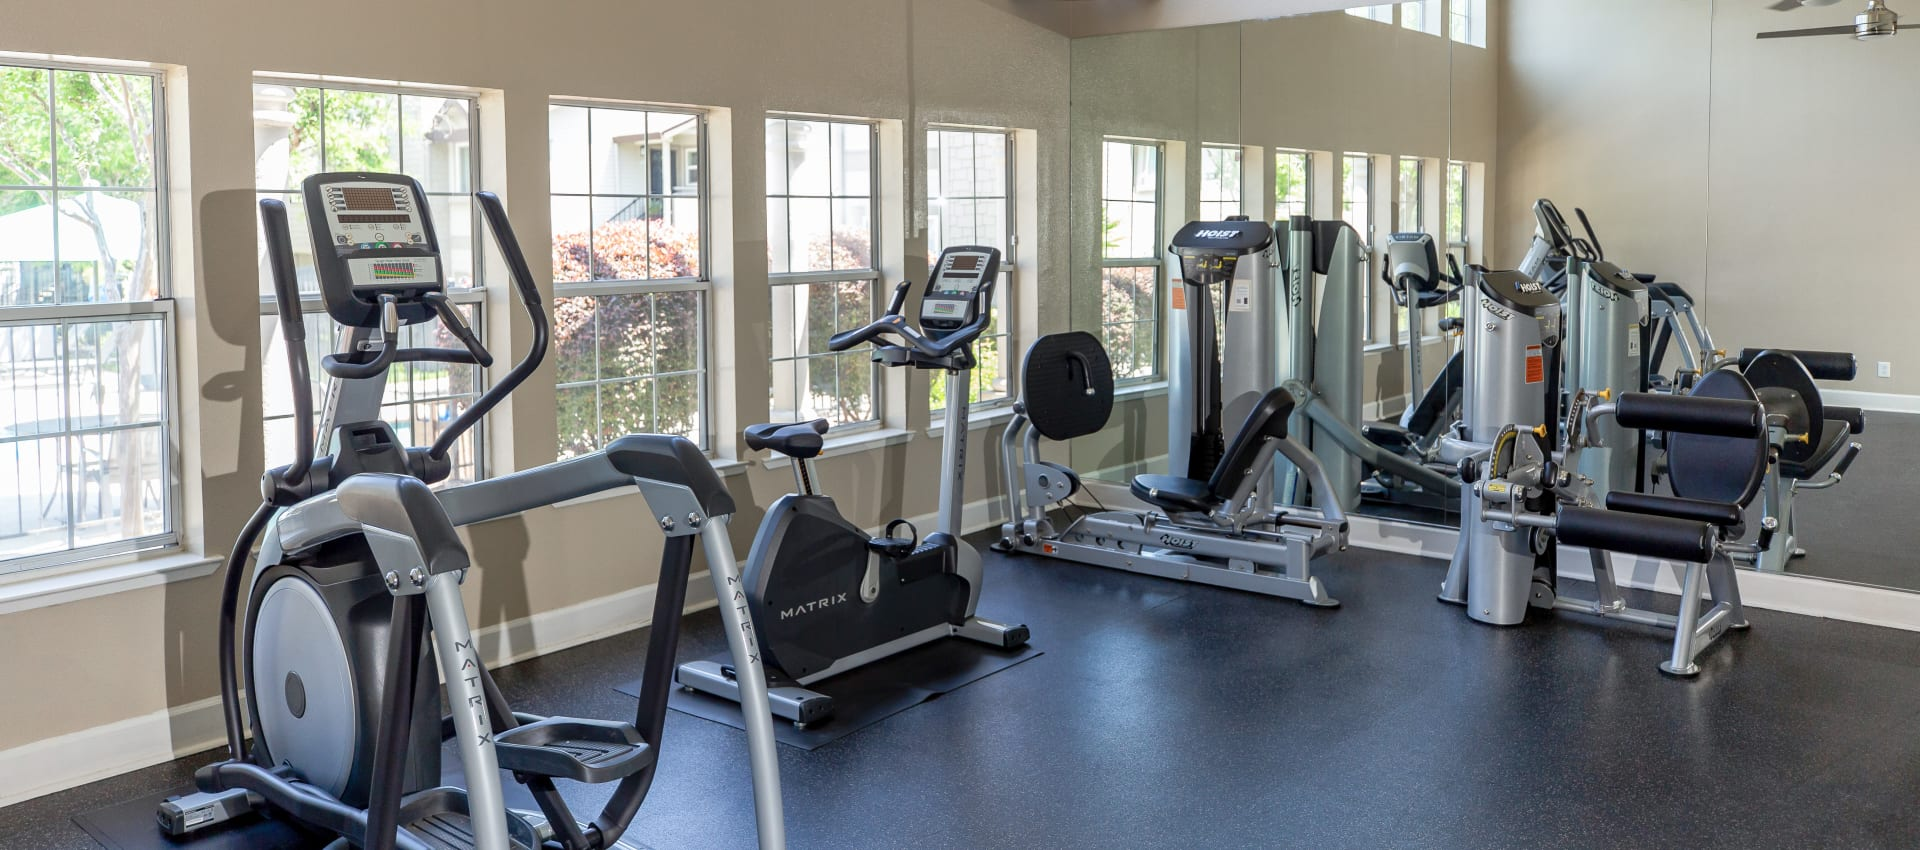 Resident fitness center at Shaliko in Rocklin, California.